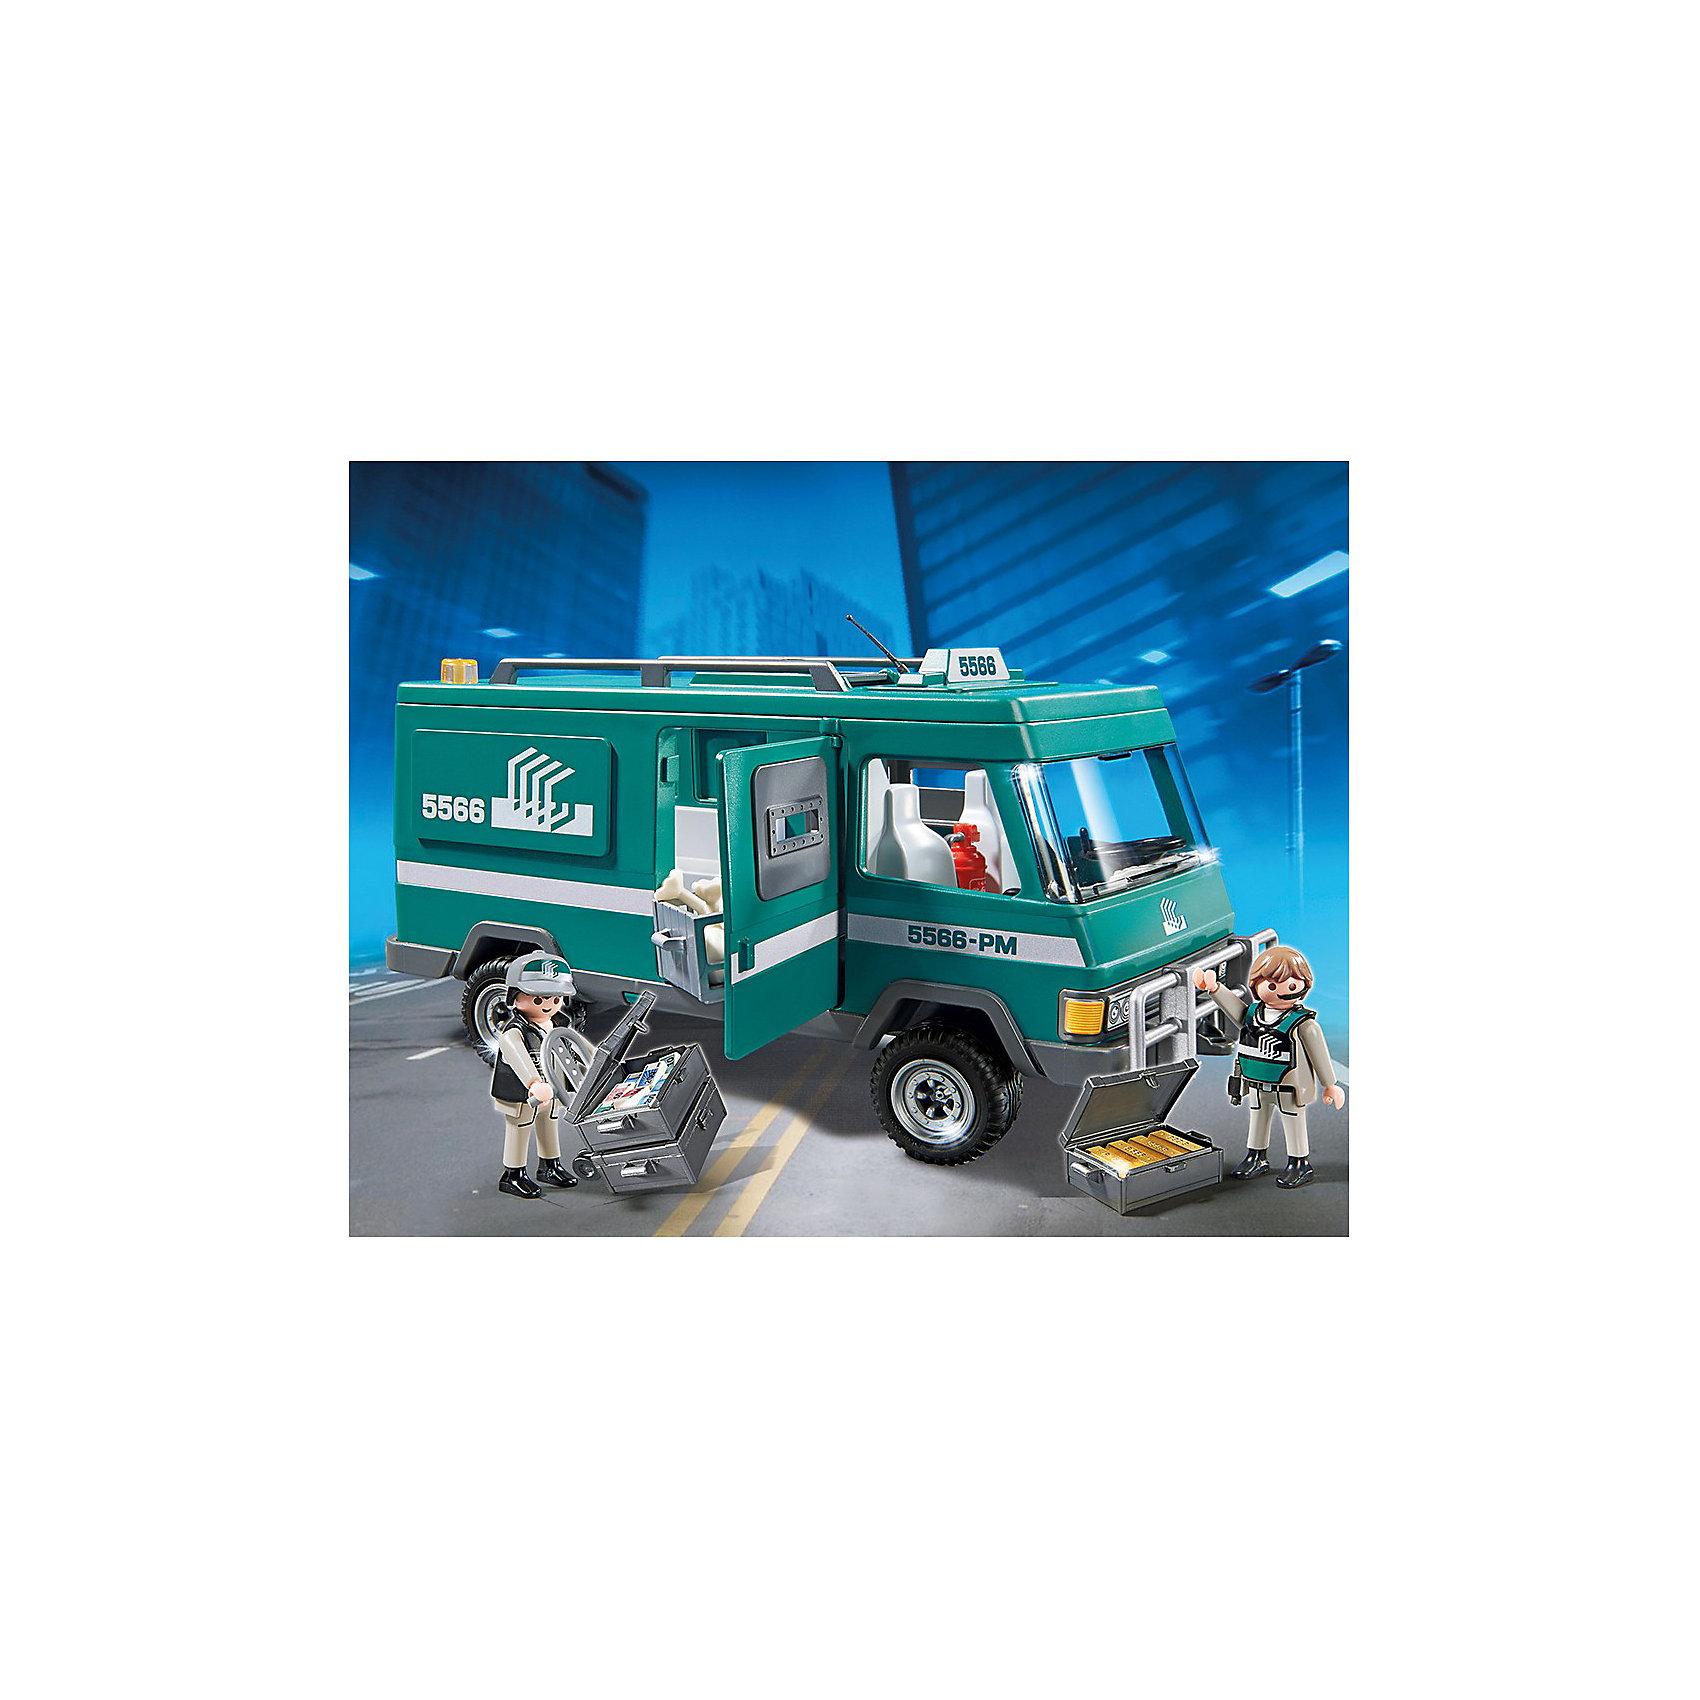 PLAYMOBIL® Инкассаторский автомобиль, PLAYMOBIL купить автомобиль б у в донецке до 33000 грн